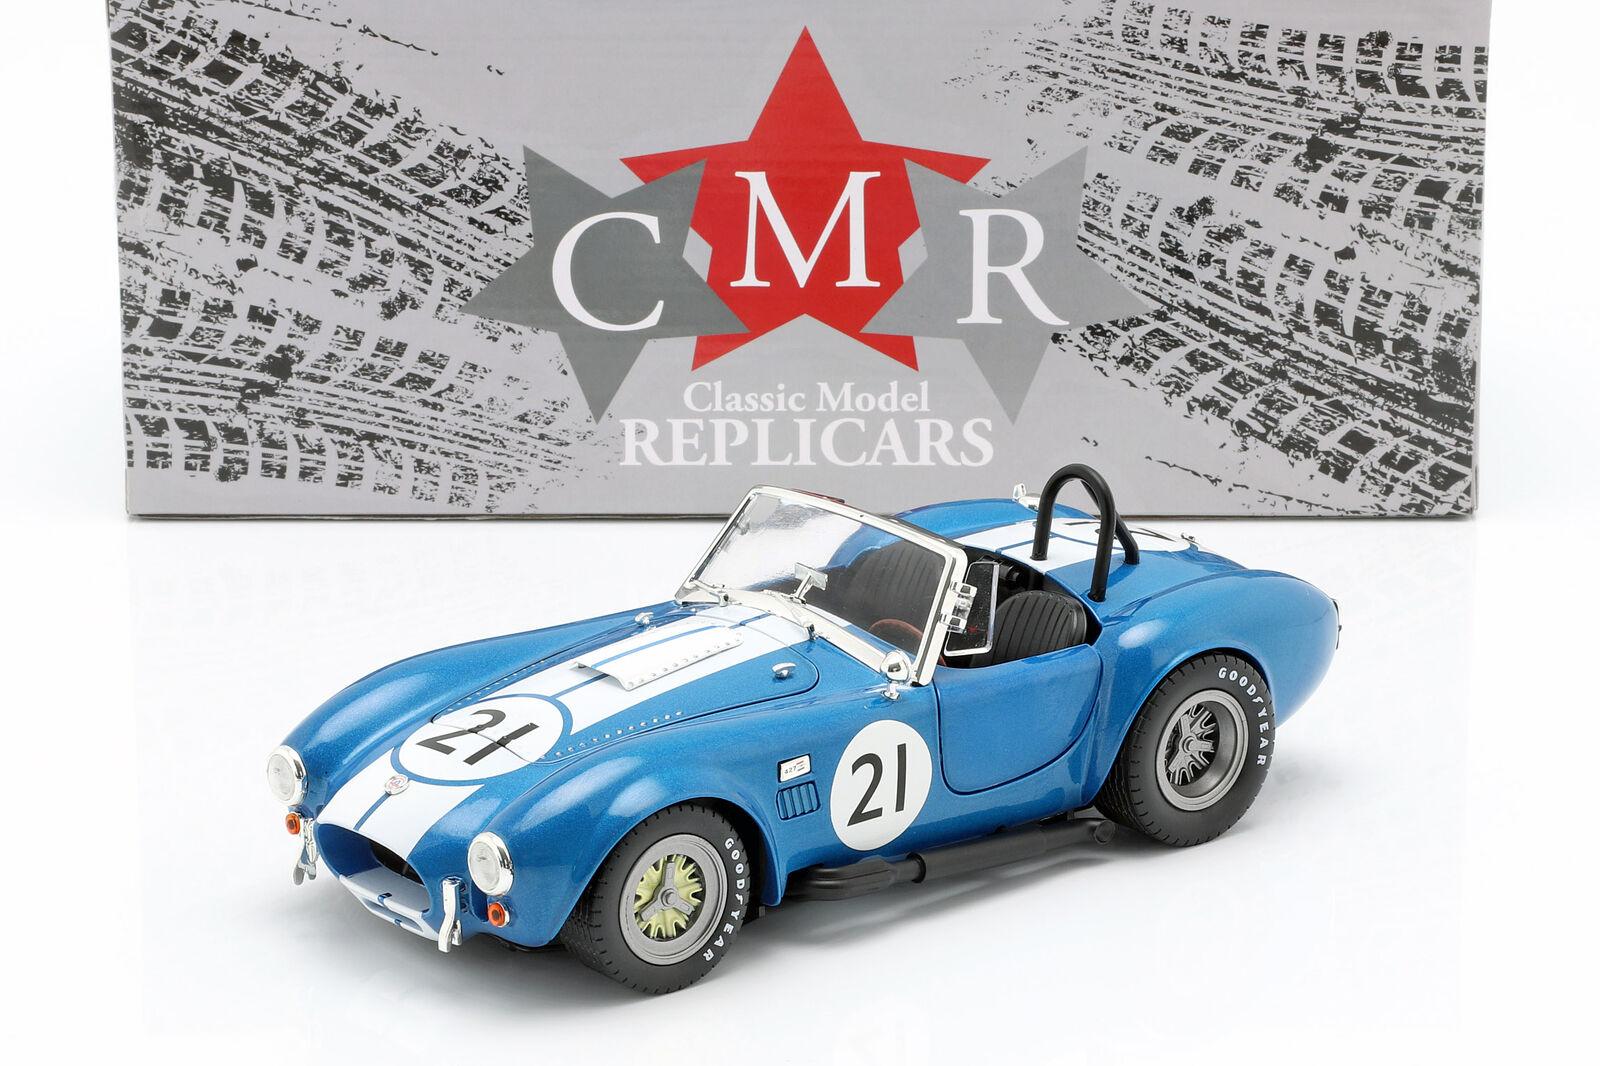 Shelby Cobra 427 Racing blu biancao 1 18 Cmr